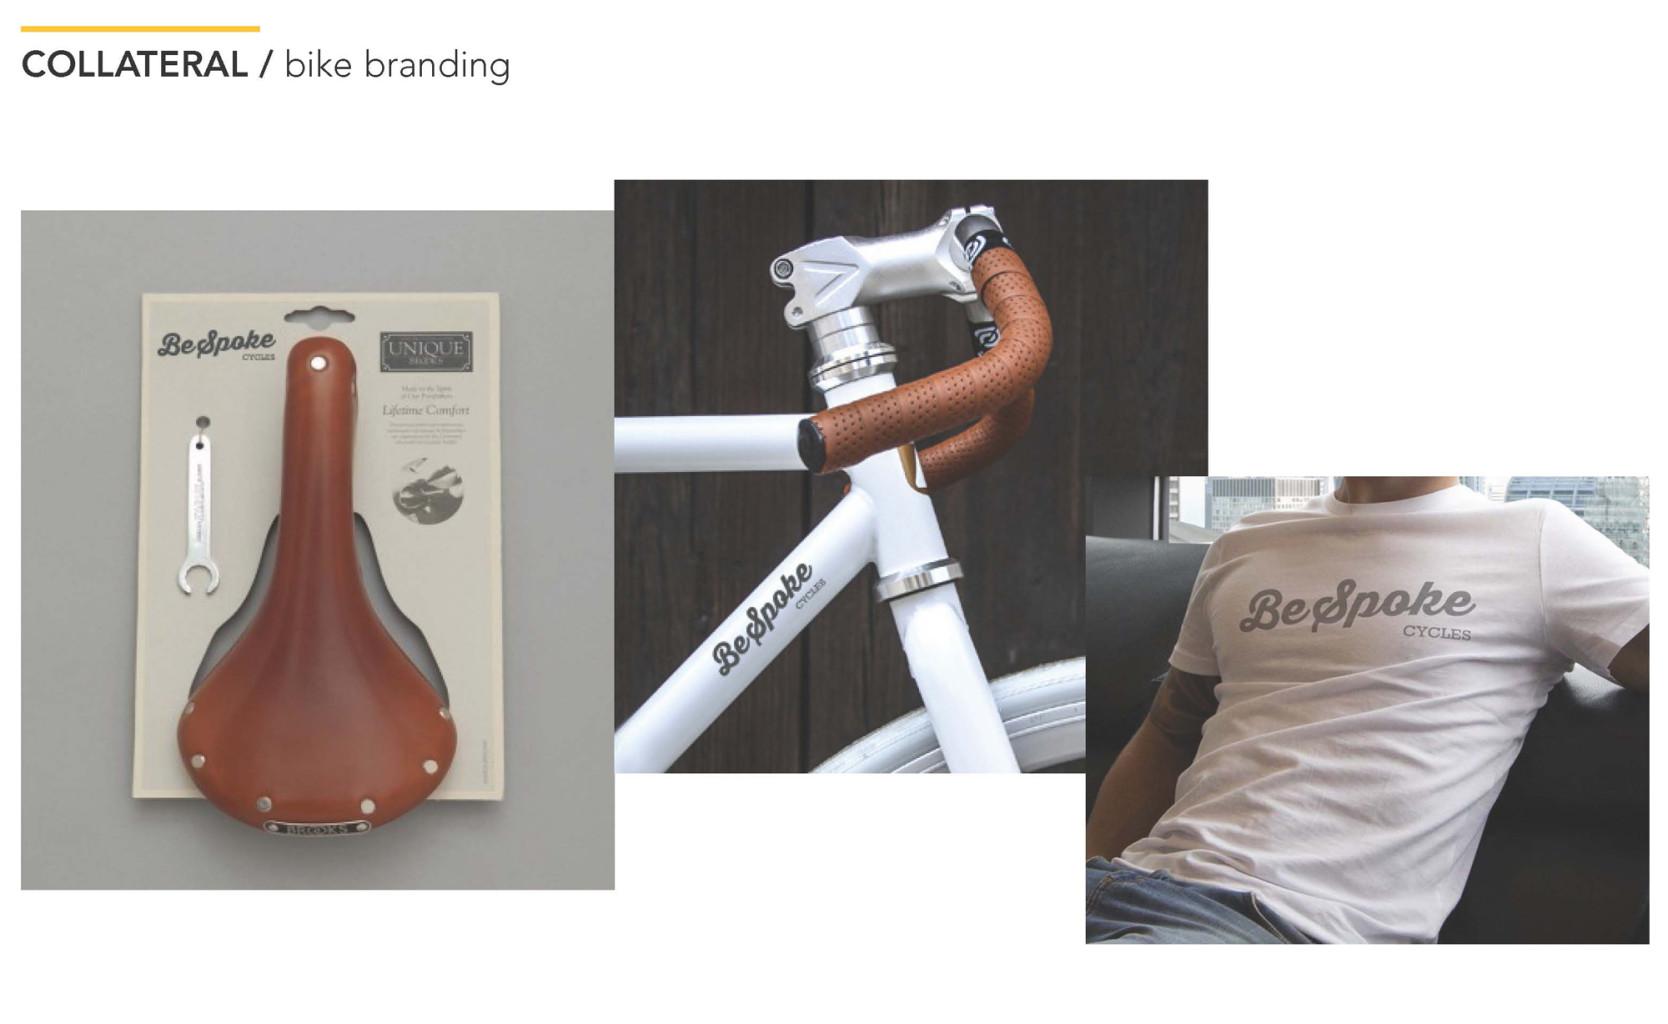 bespoke branding 80